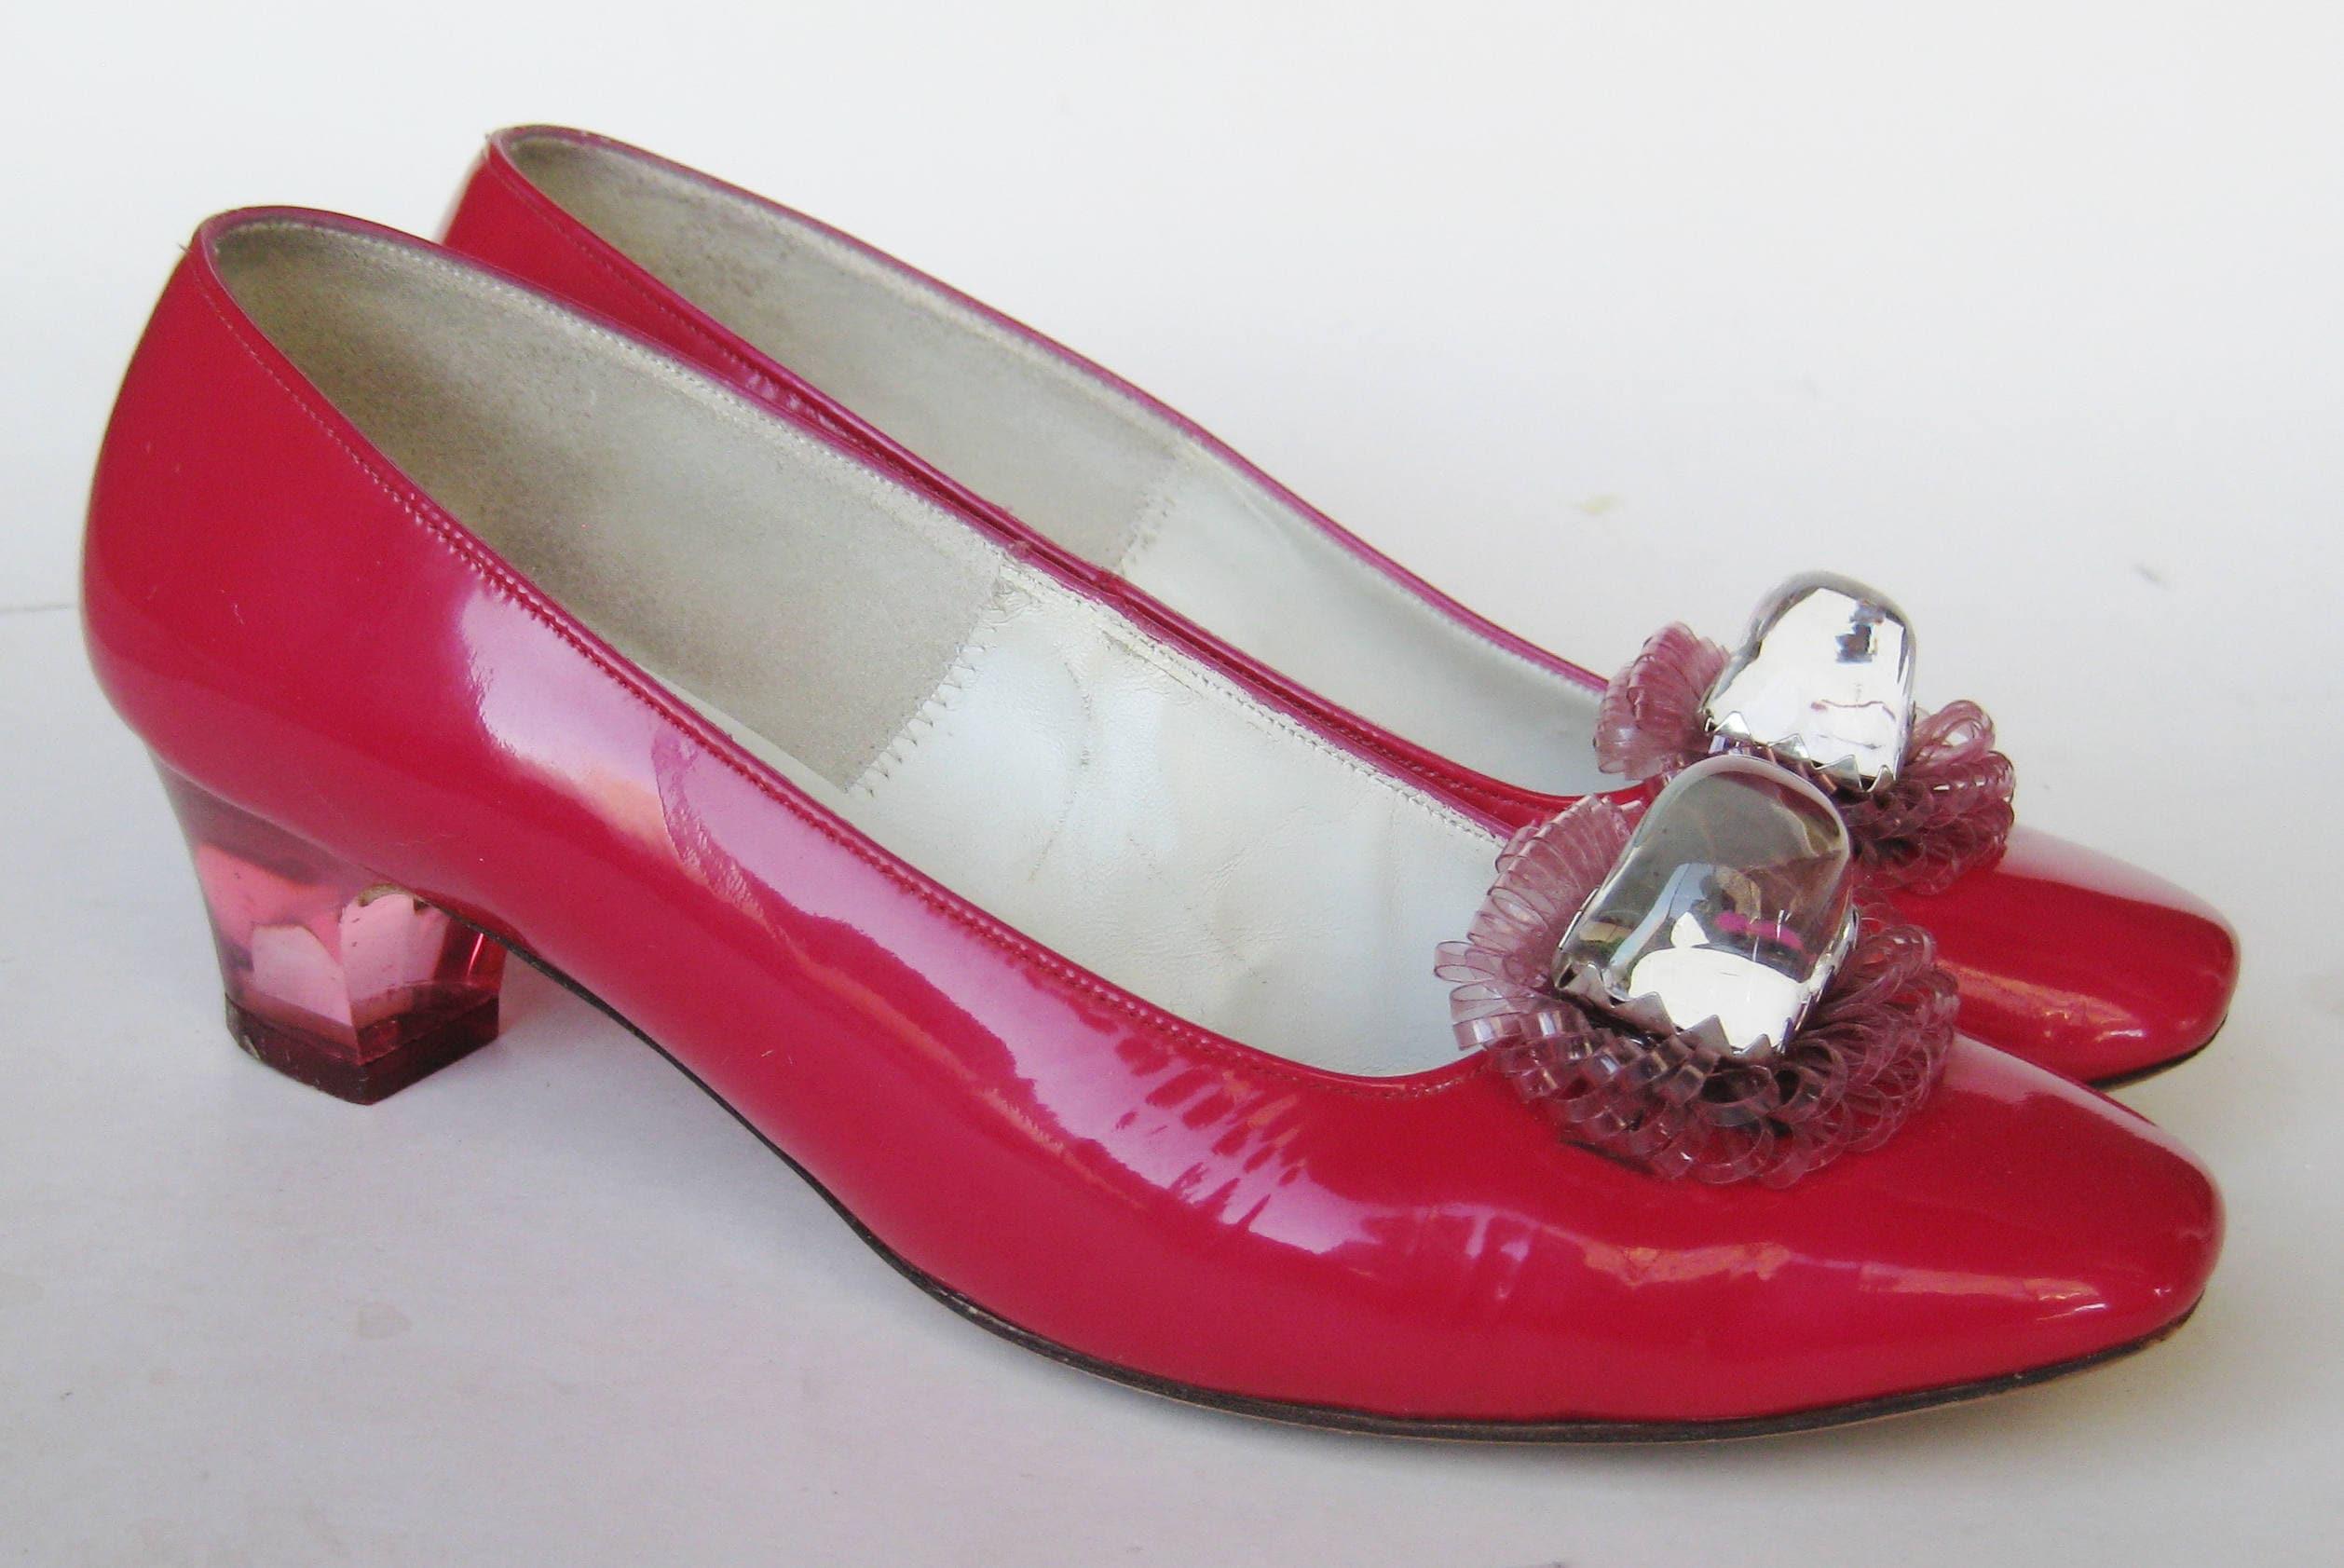 a91bda67ff2 Vintage 60s 70s Shoes Hot Pink Lucite Heel Square Toe Shoes 6